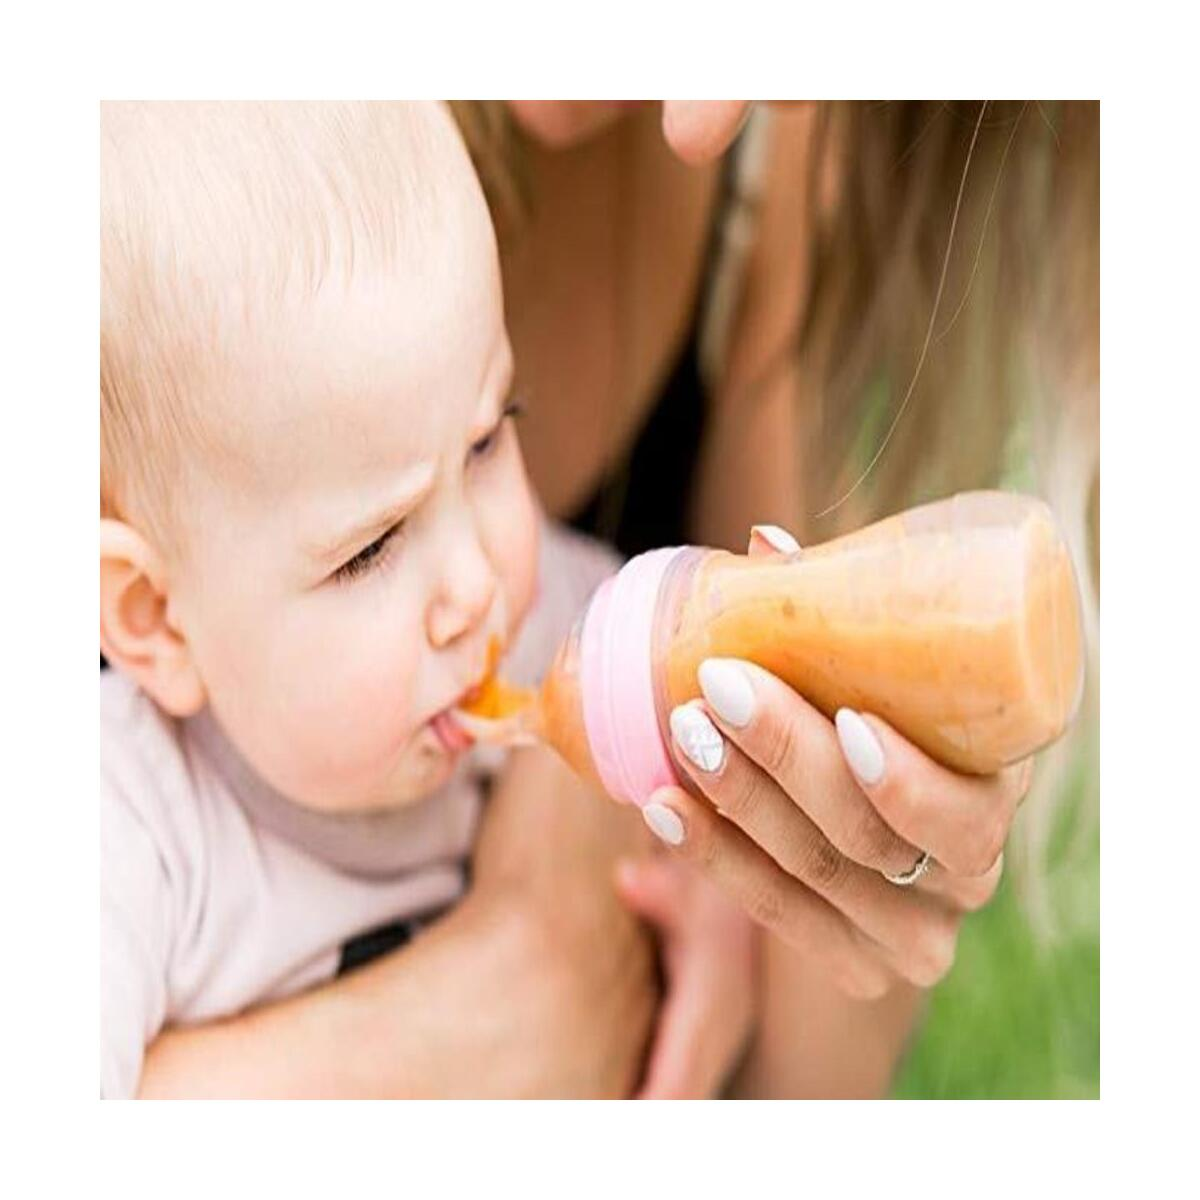 Infant Baby Silicone Gel Feeding Bottle With Spoon Newborn Toddler Food Supplement Rice Cereal Bottles Milk Feeder 90ml